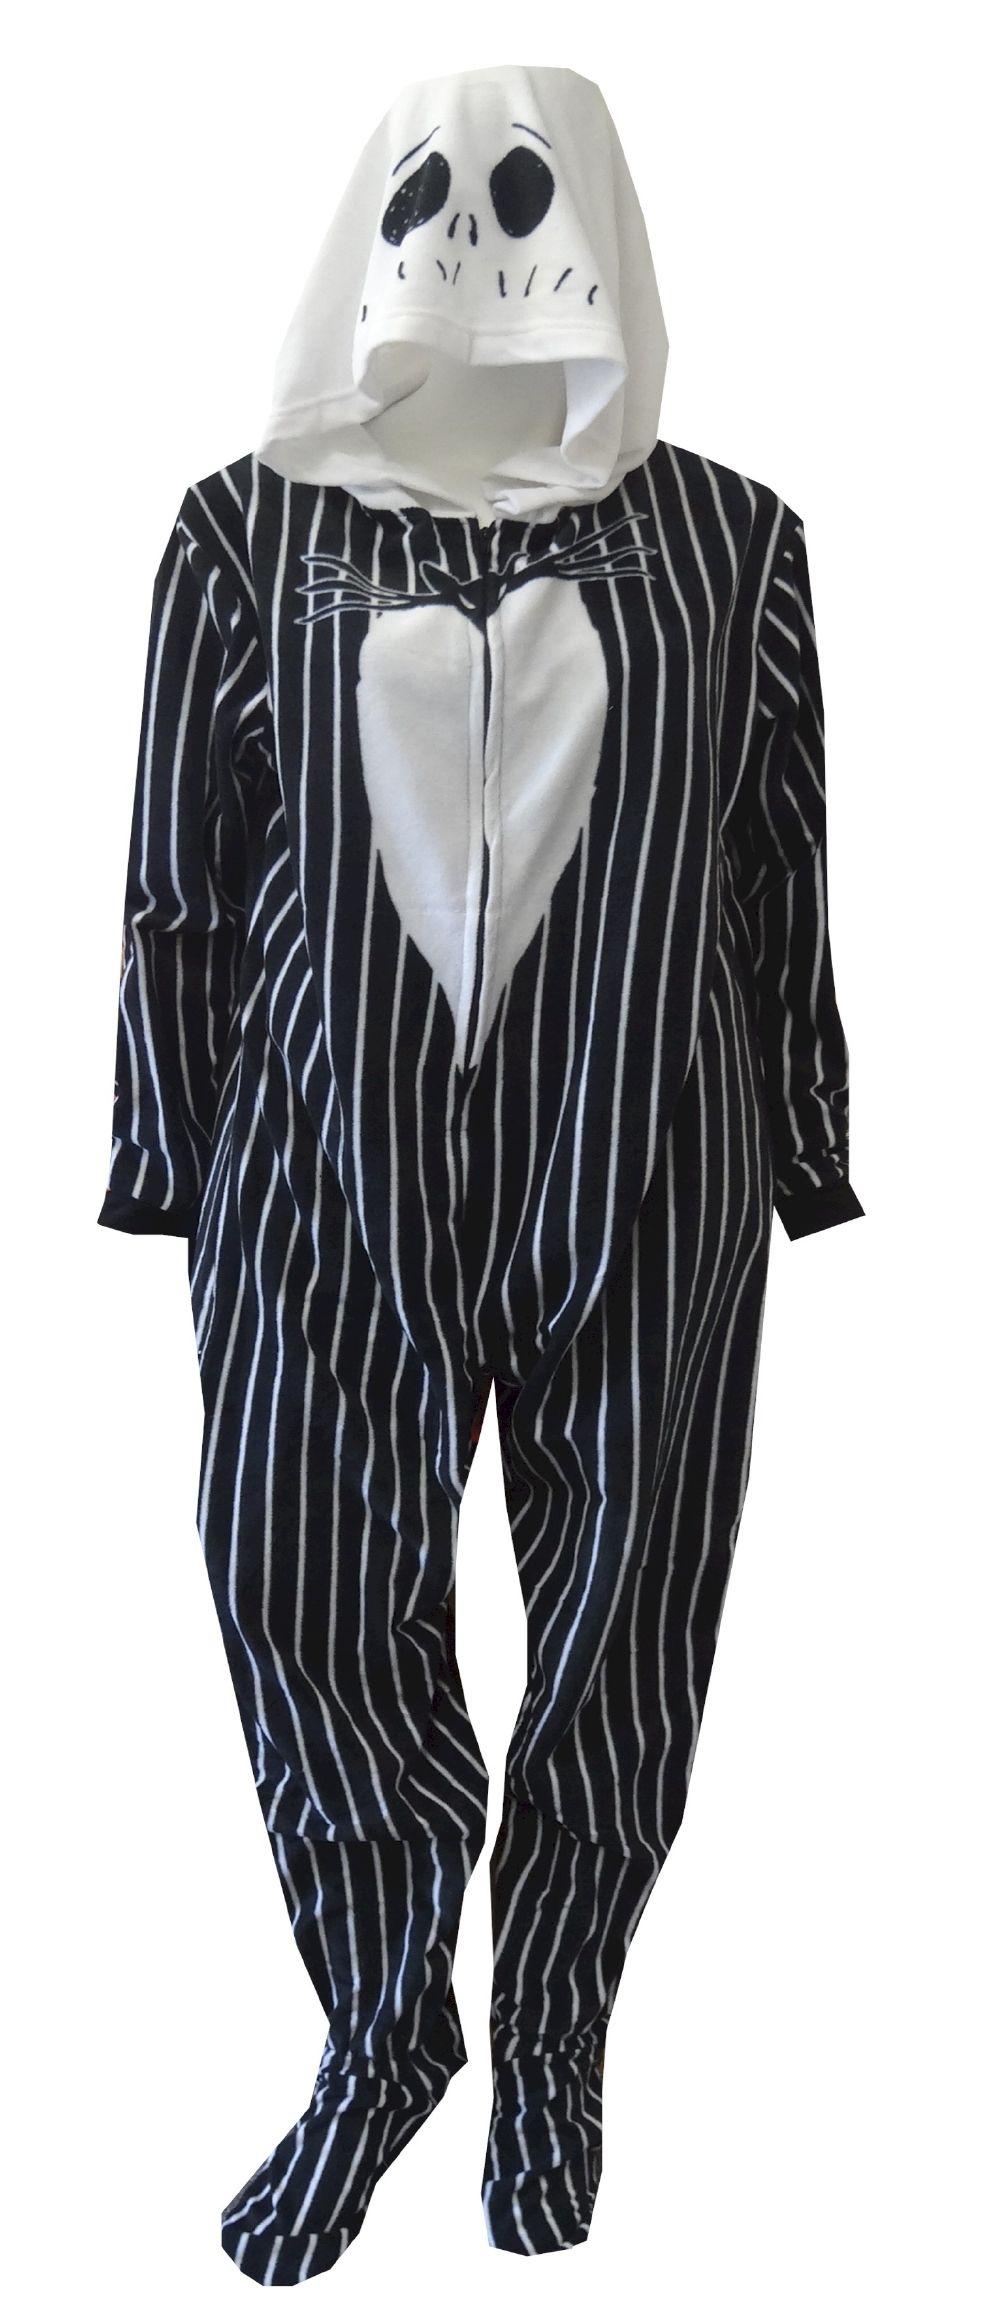 Nightmare Before Christmas Jack Skellington One-Piece Hooded PJs Pajamas